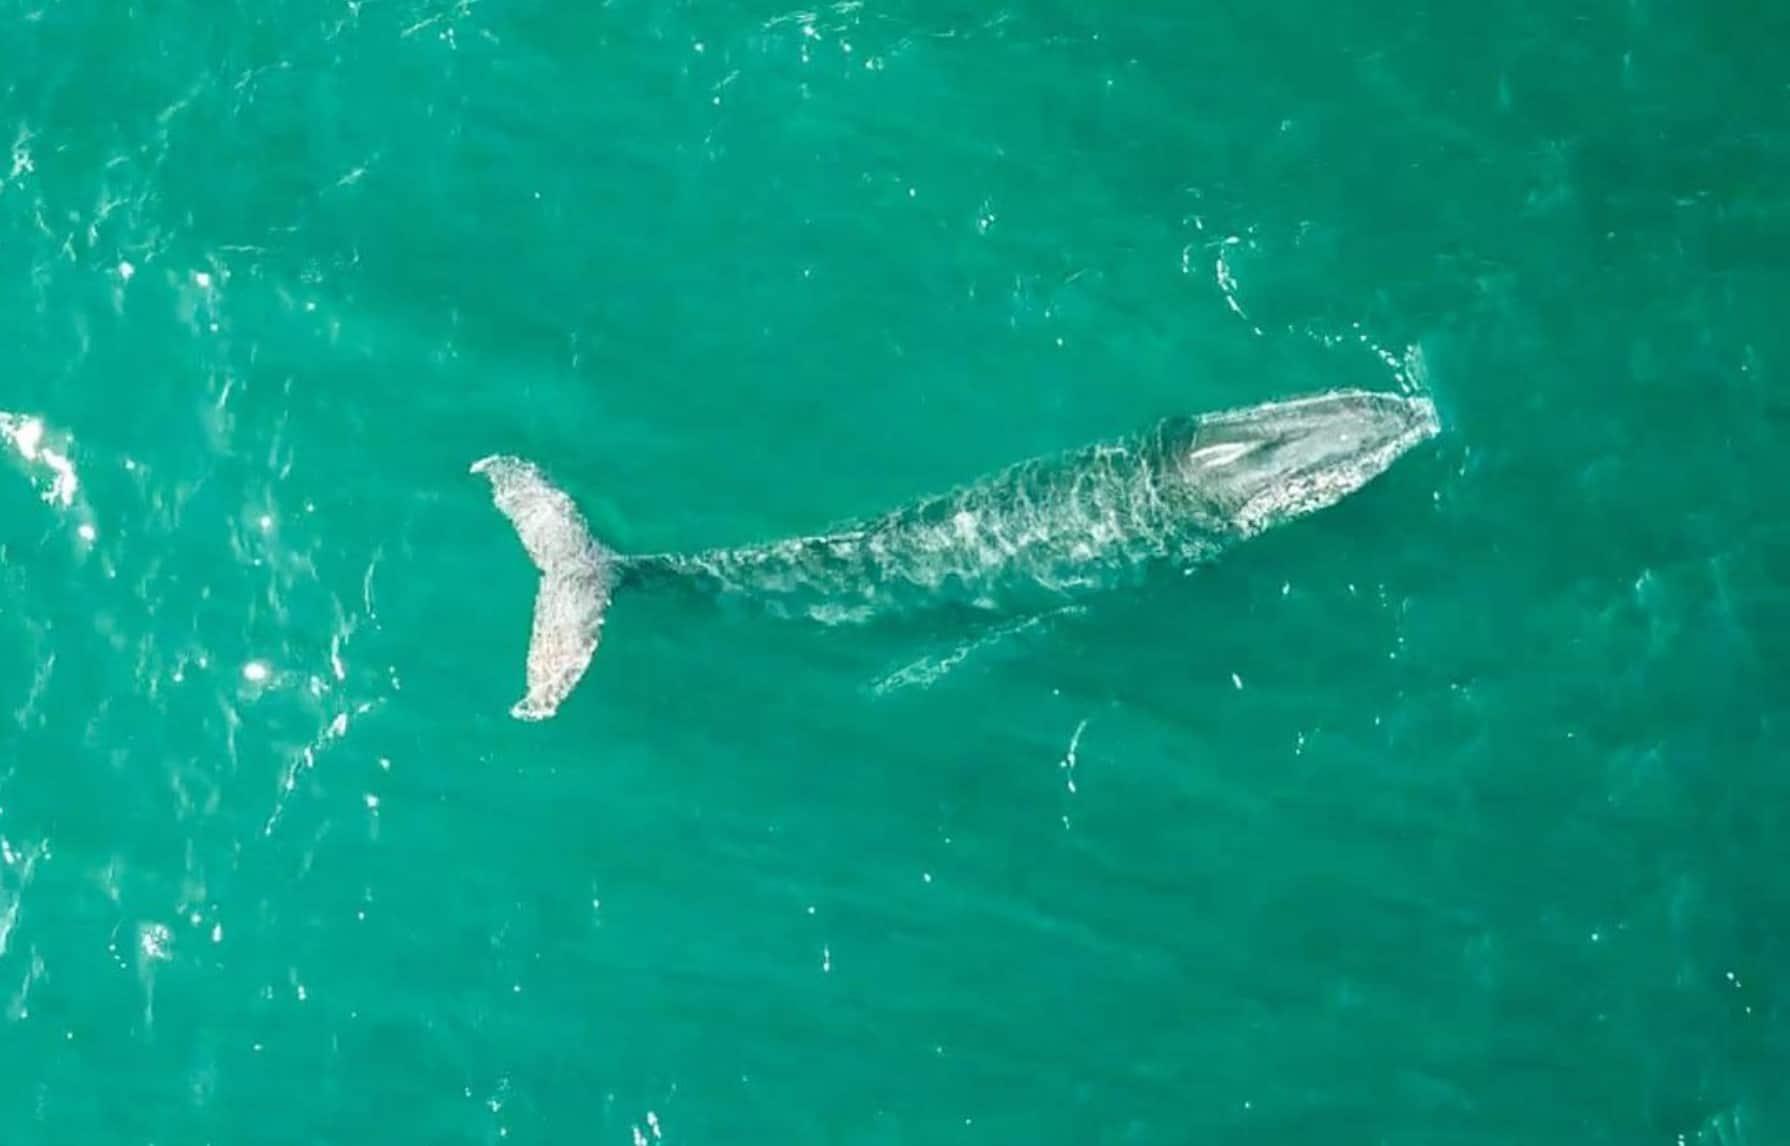 Het walvissen seizoen in Australië komt ten einde